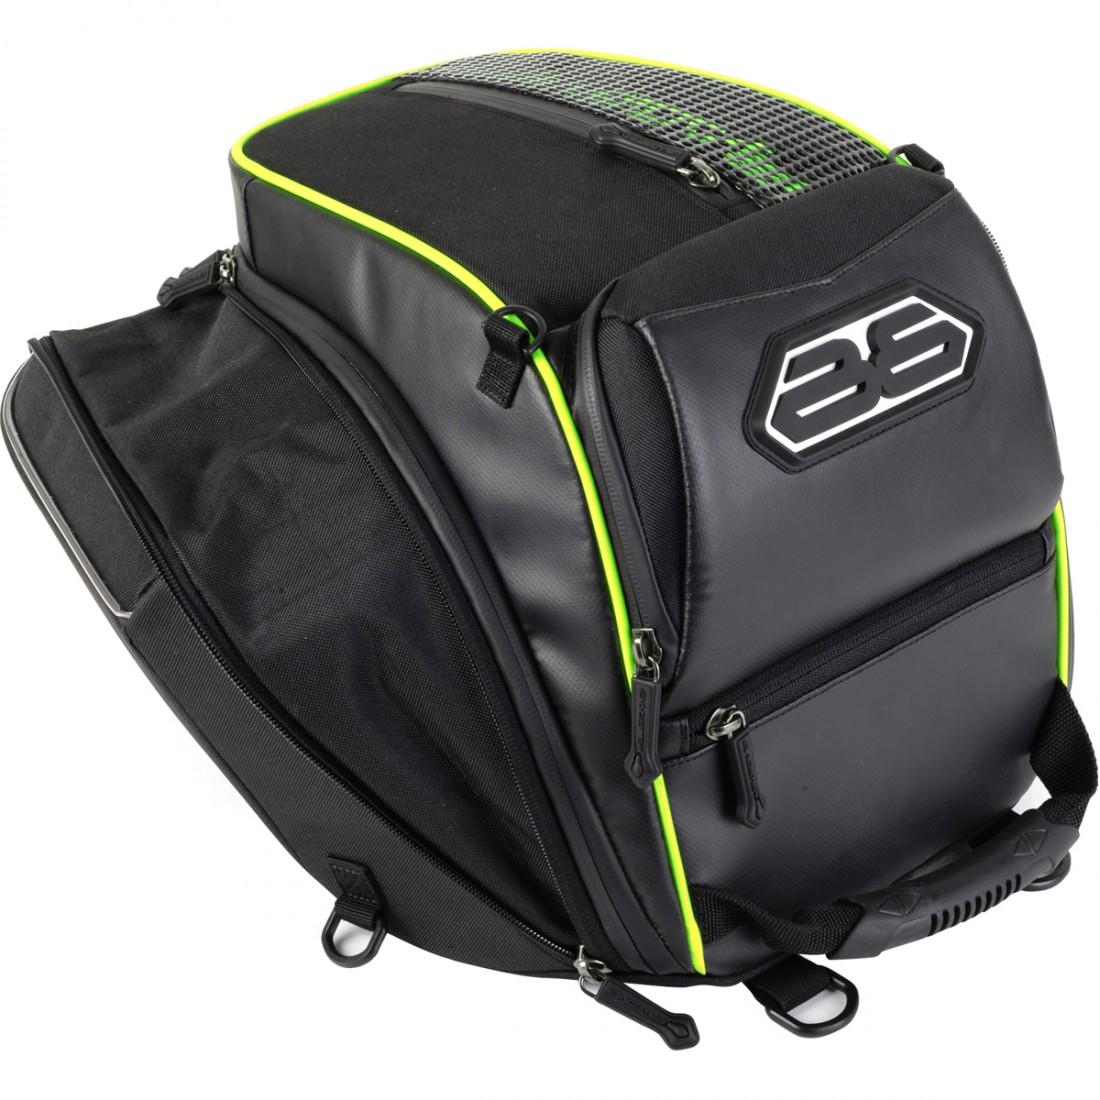 BAGSTER Transformer Black Bag · Motocard